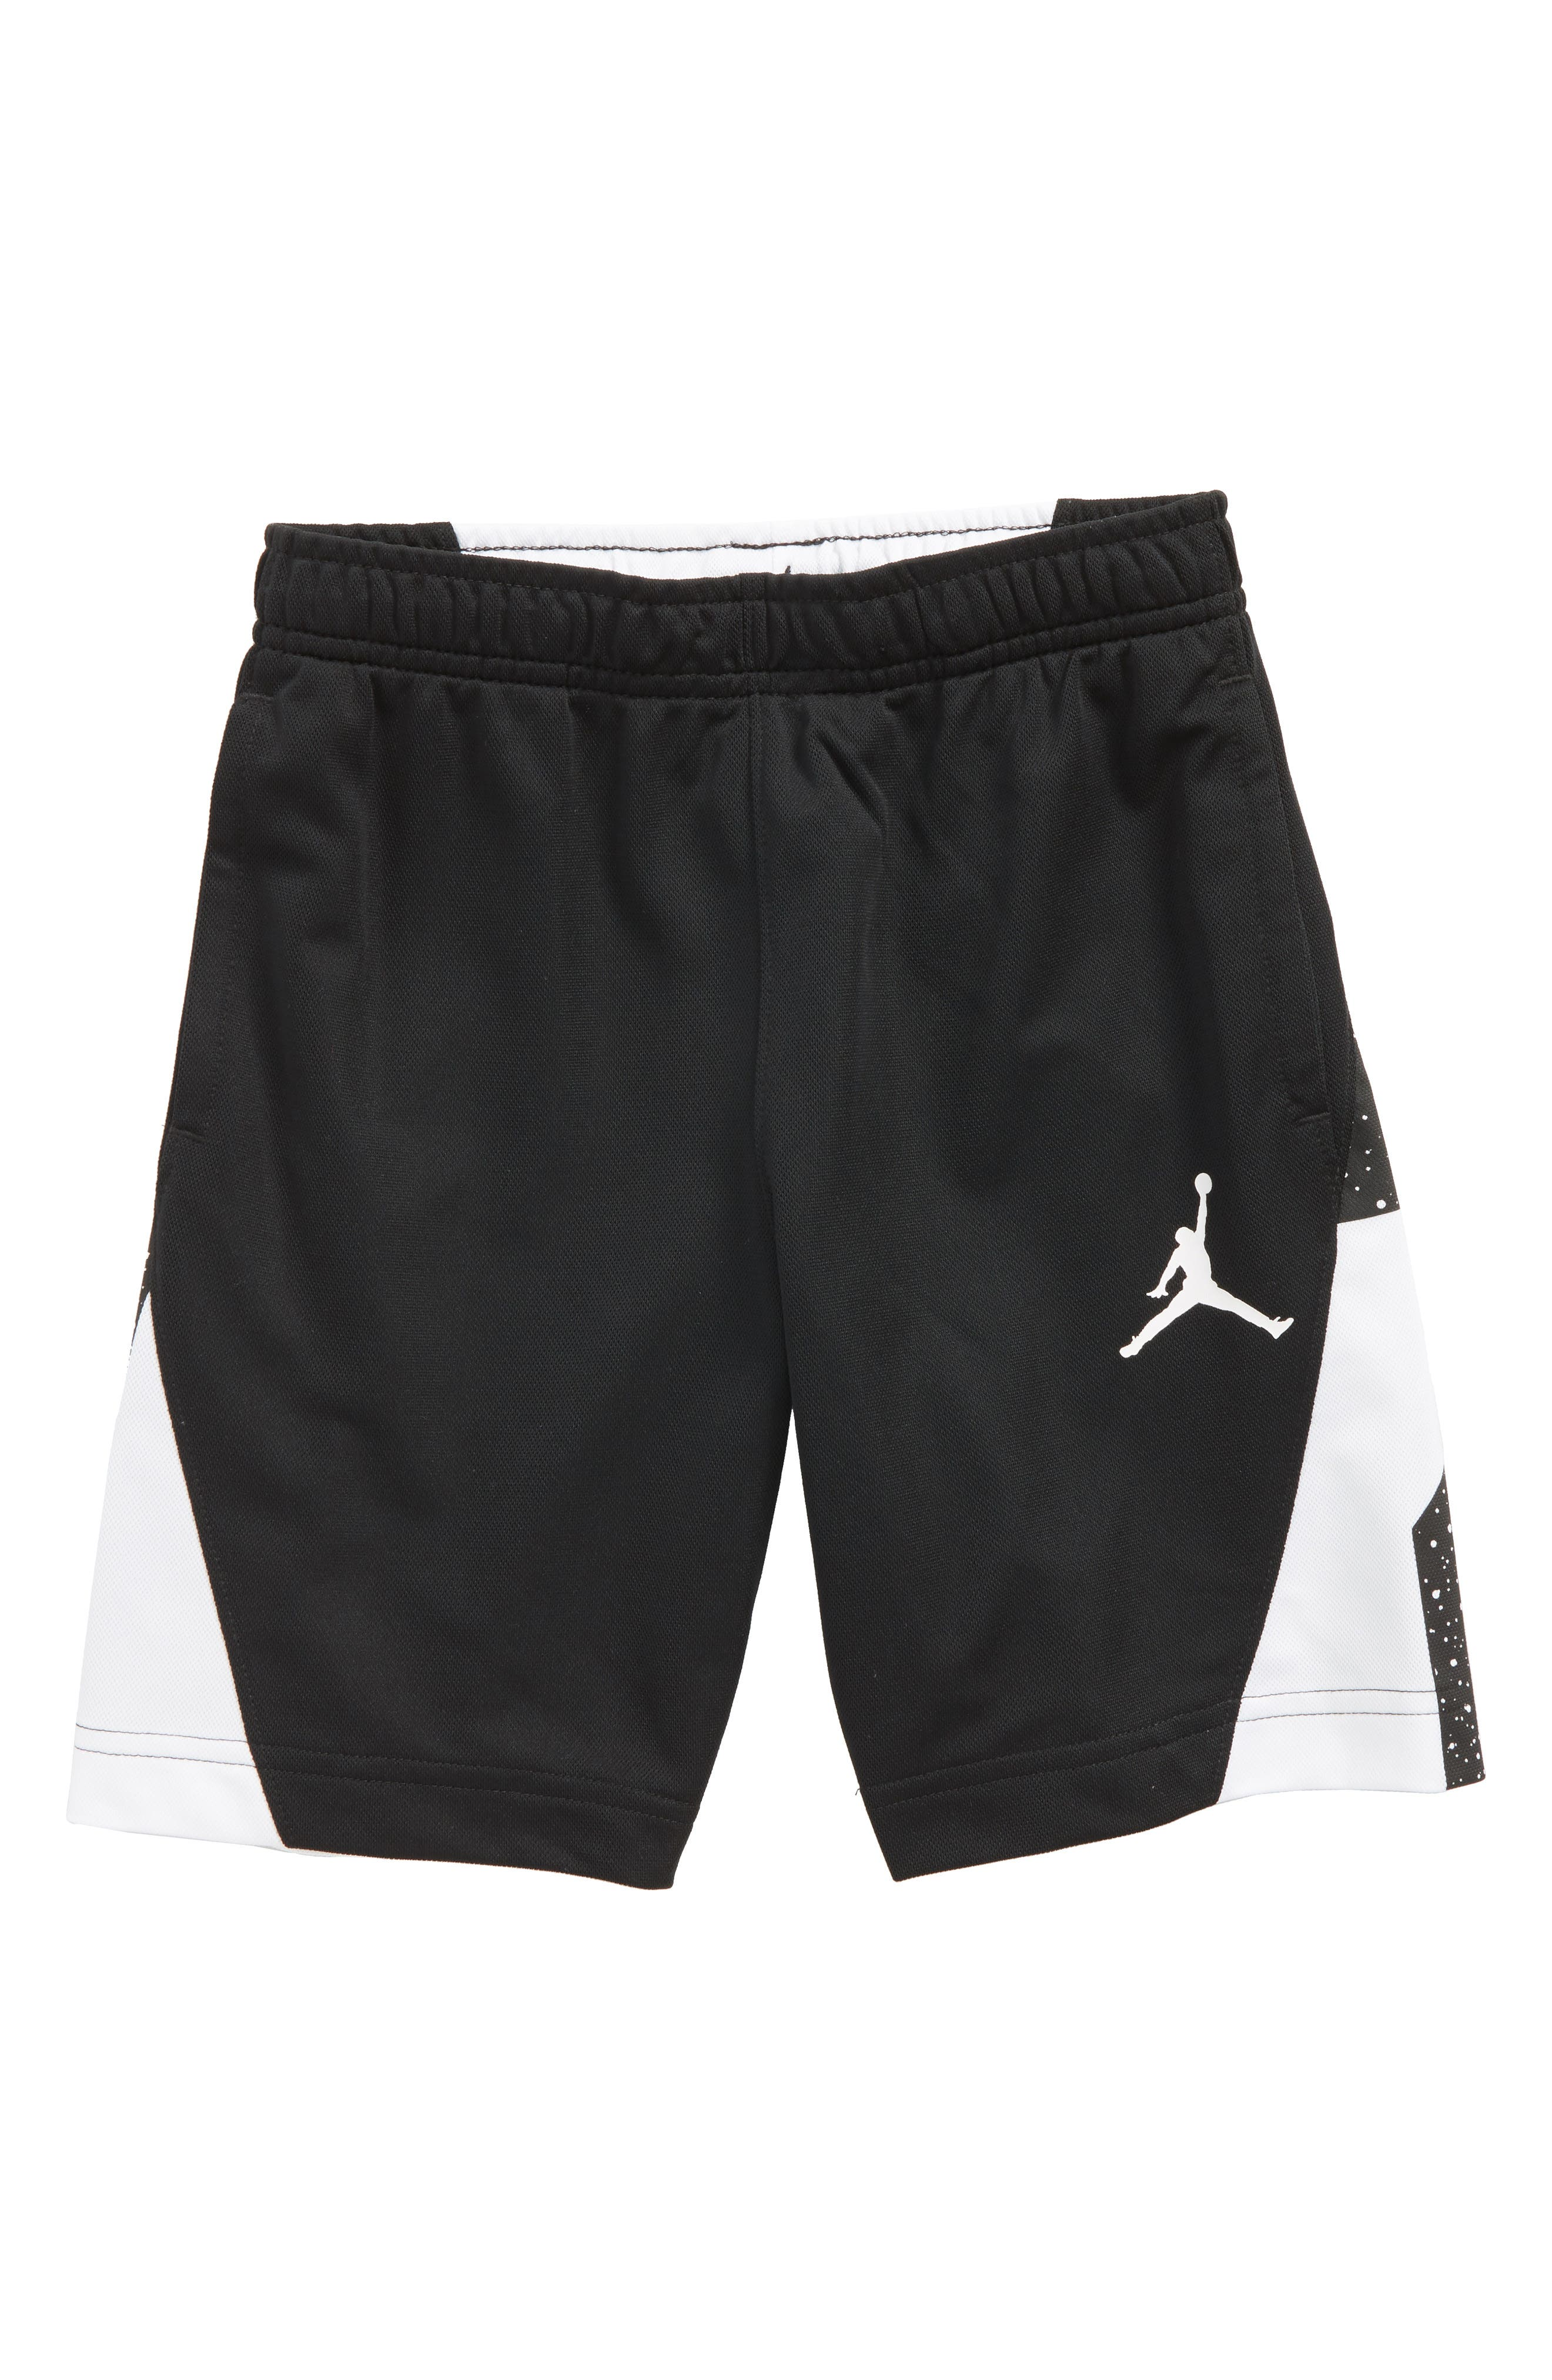 Jordan Dry Speckle 23 Training Shorts,                             Main thumbnail 1, color,                             001